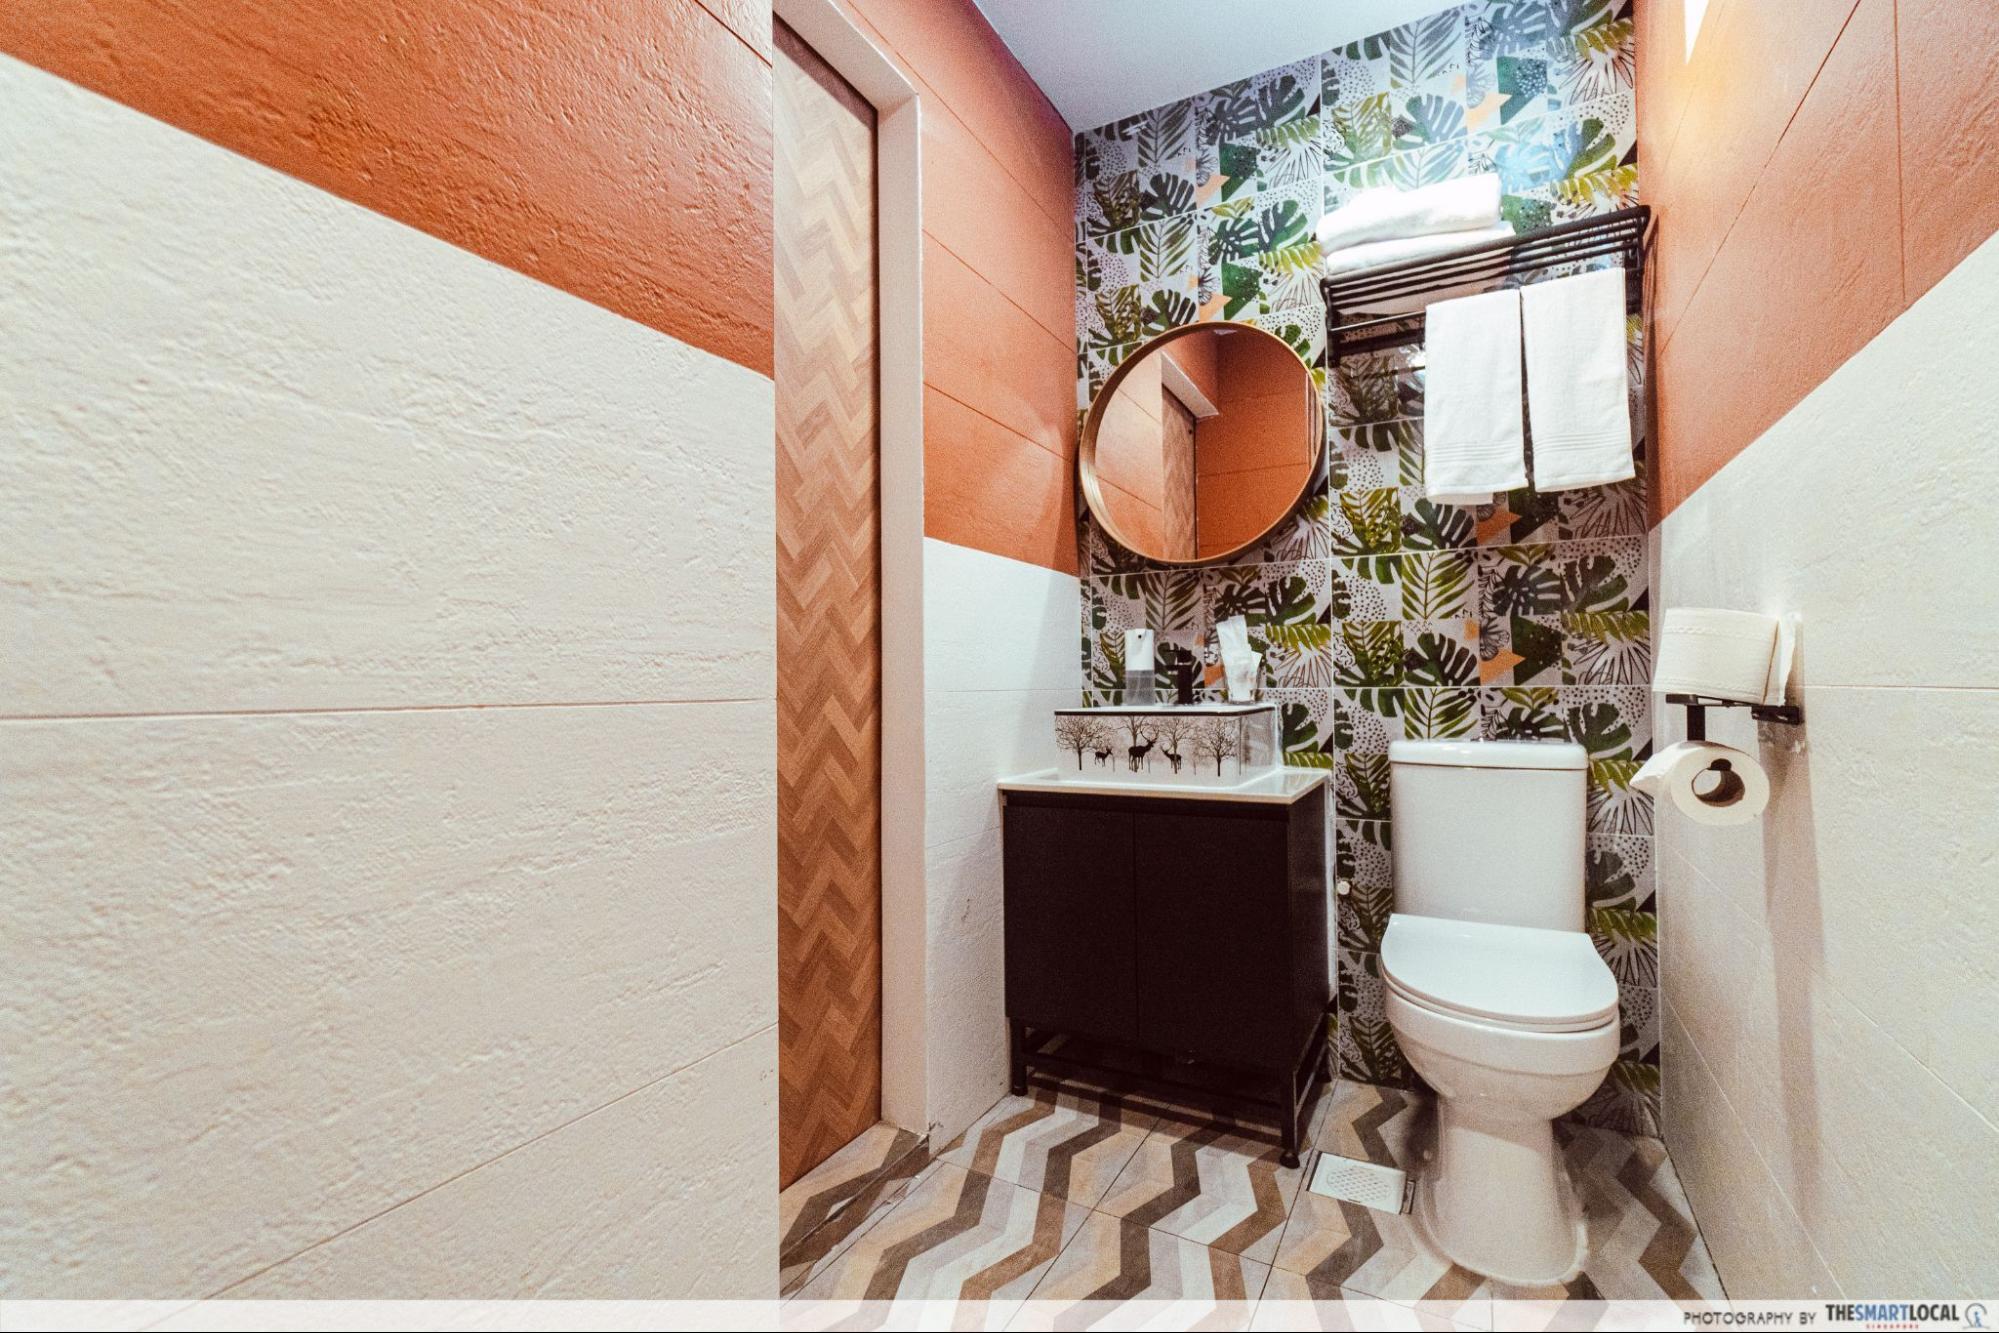 SG hotel on wheels - toilet